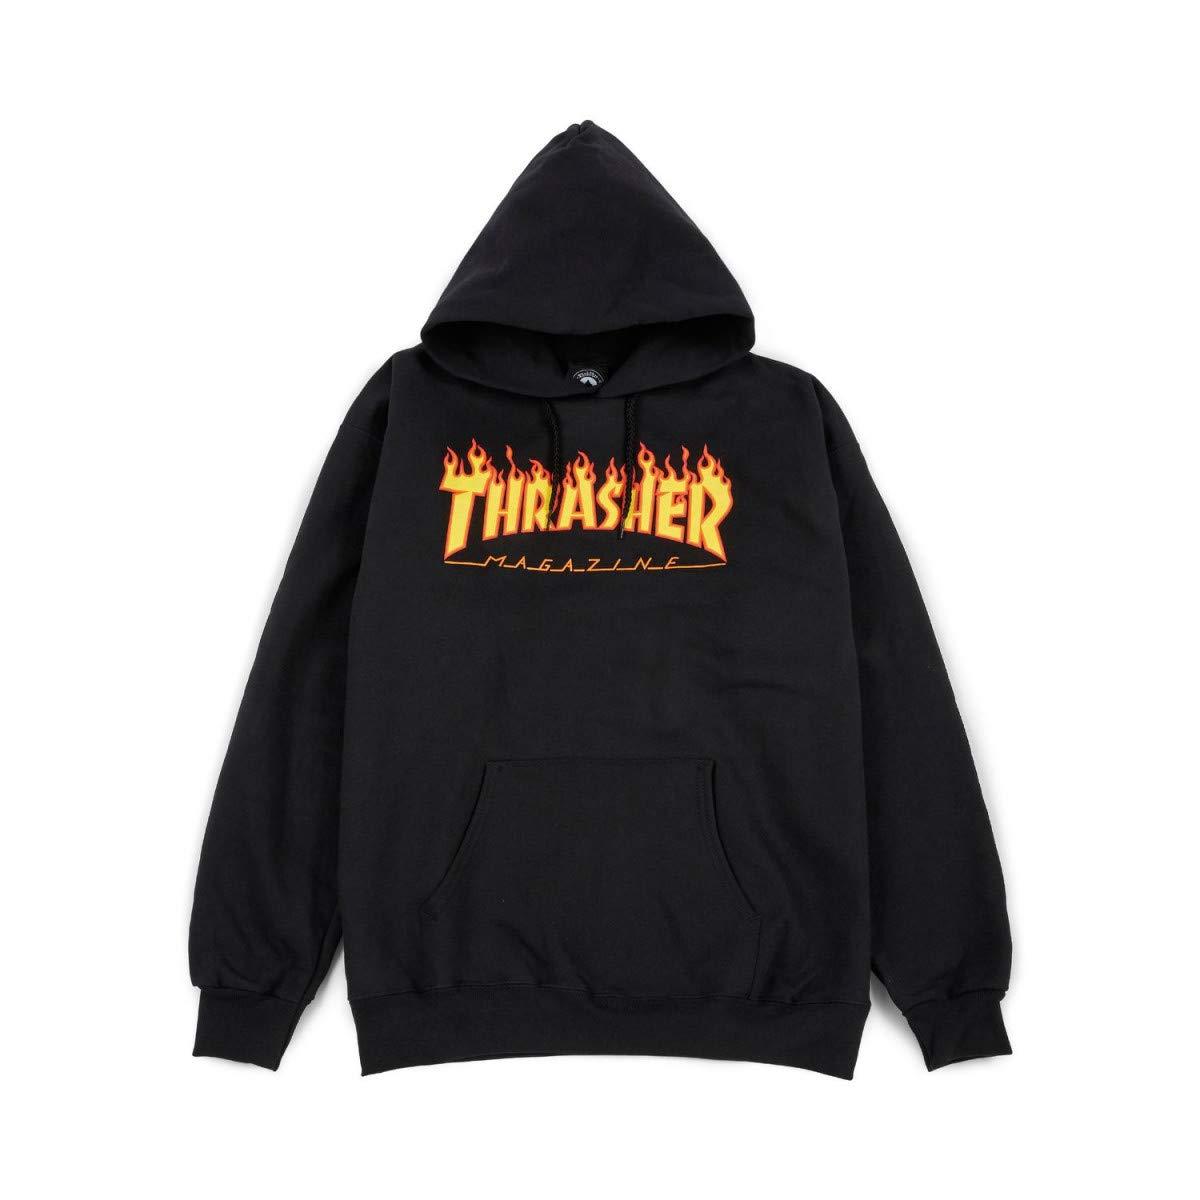 Hoodies - Thrasher Judge Hoodie - Black - Black - Small